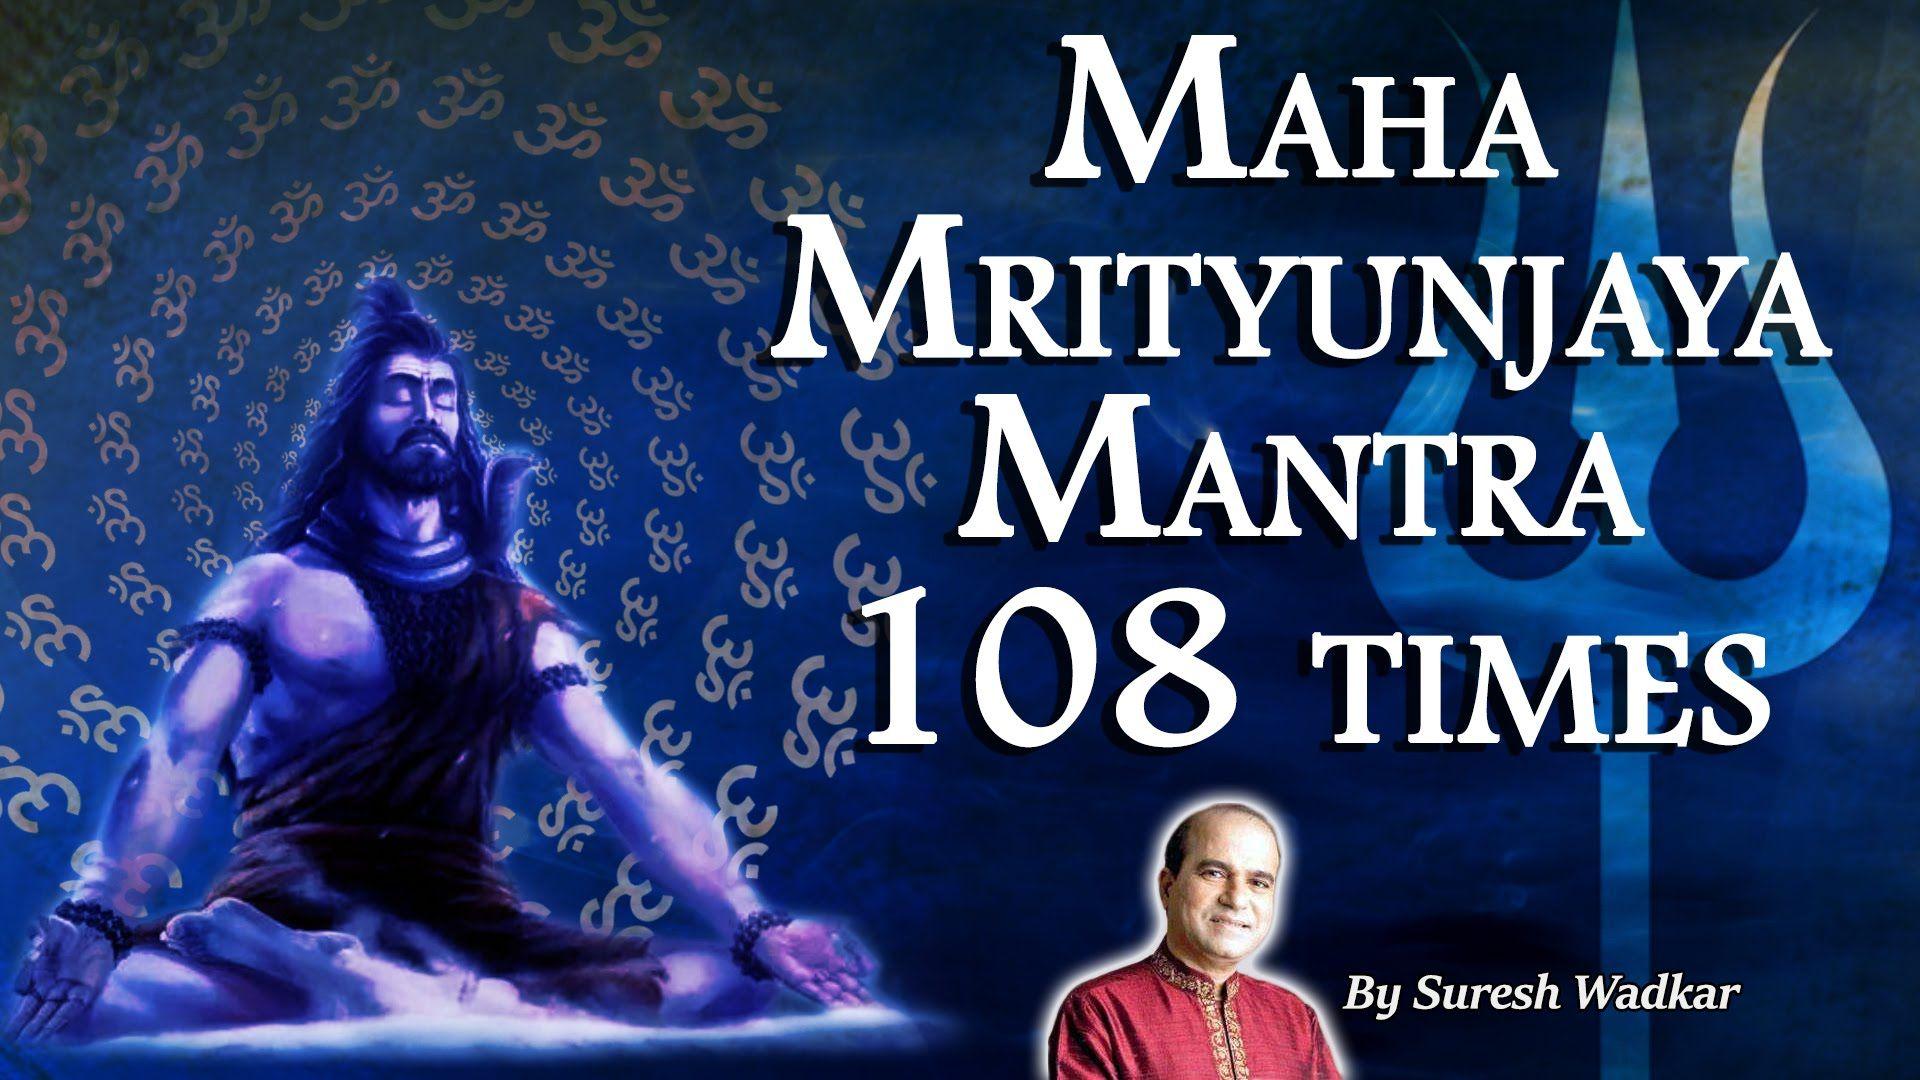 Shiva Mantra Maha Mrityunjaya Mantra By Suresh Wadkar 108 Times Peac Mantras Lord Shiva Mantra Shiva Songs